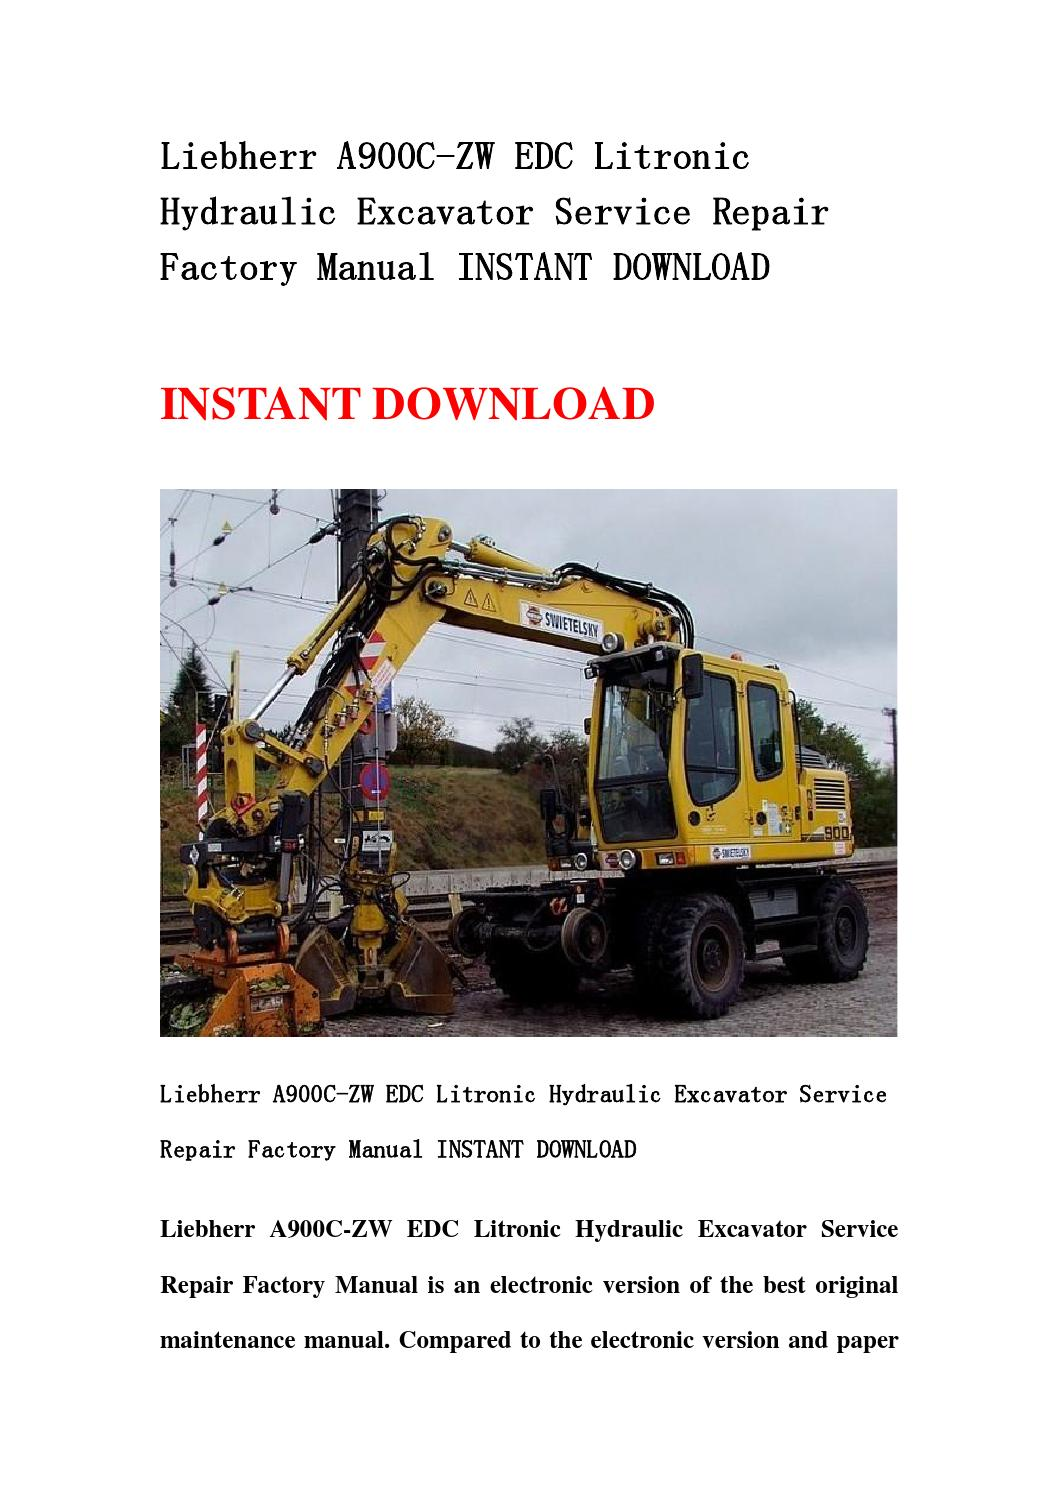 Liebherr A900c Zw Edc Litronic Hydraulic Excavator Service Repair Factory Manual Instant